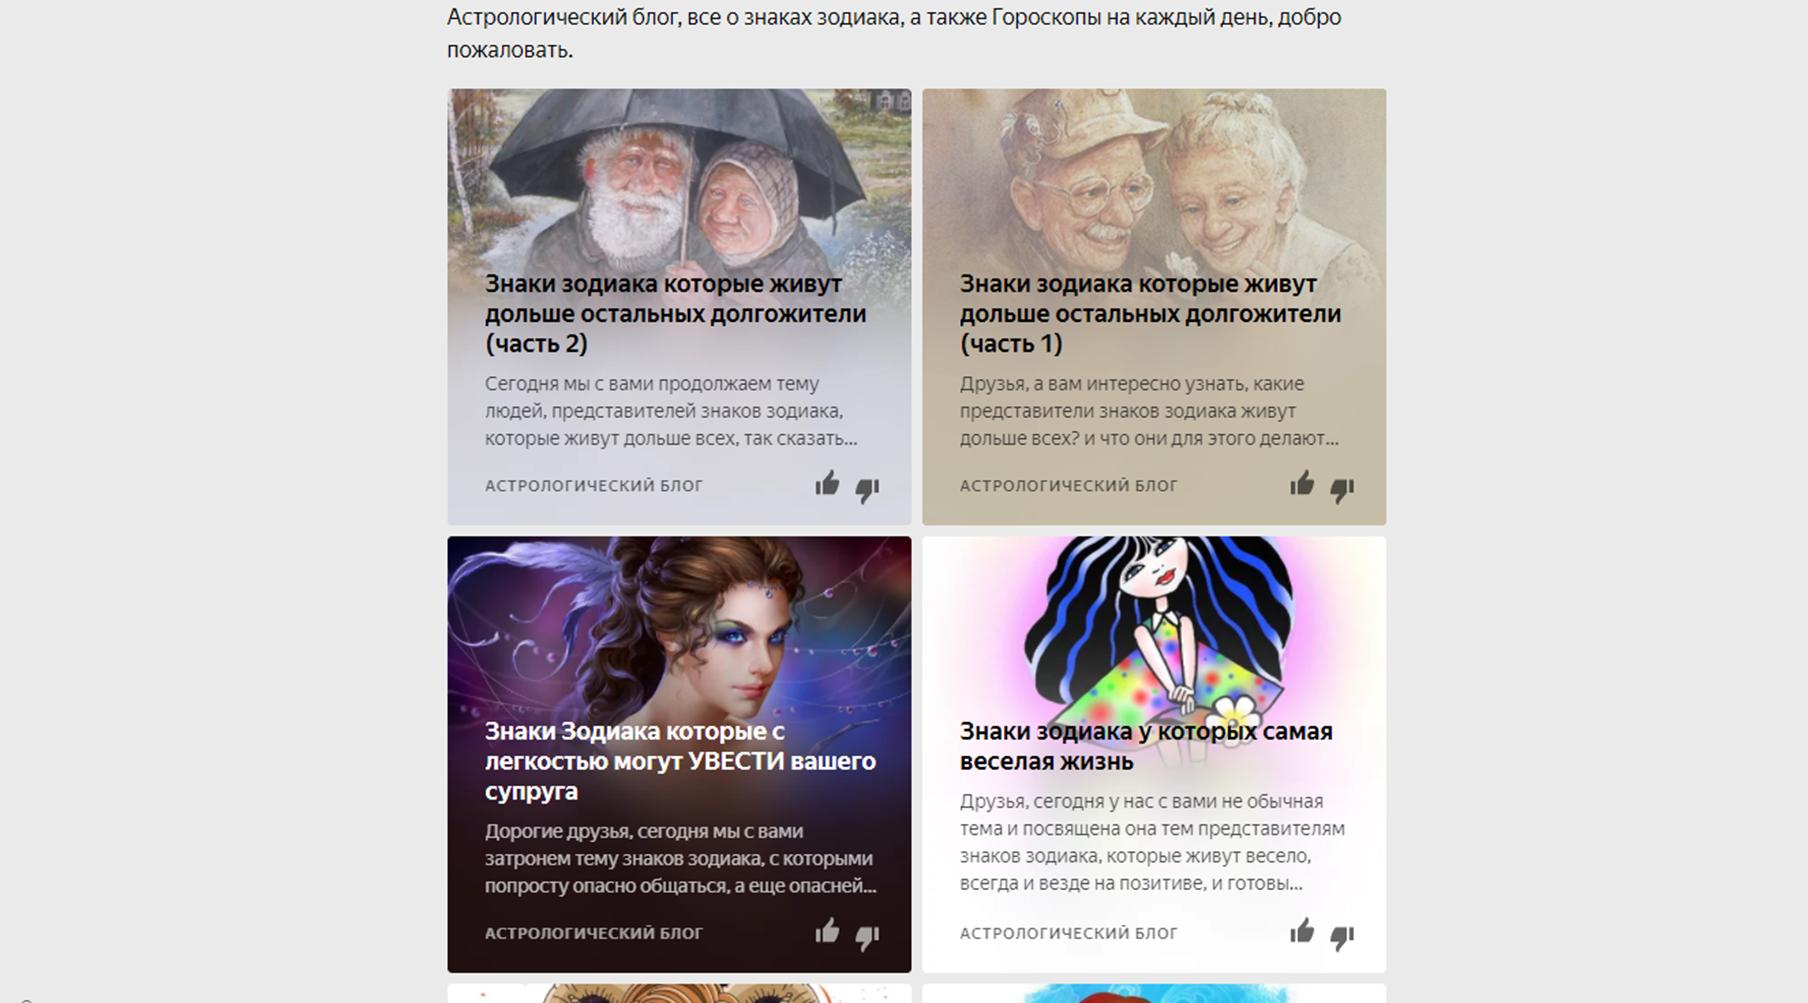 Типичный канал в Яндекс Дзен